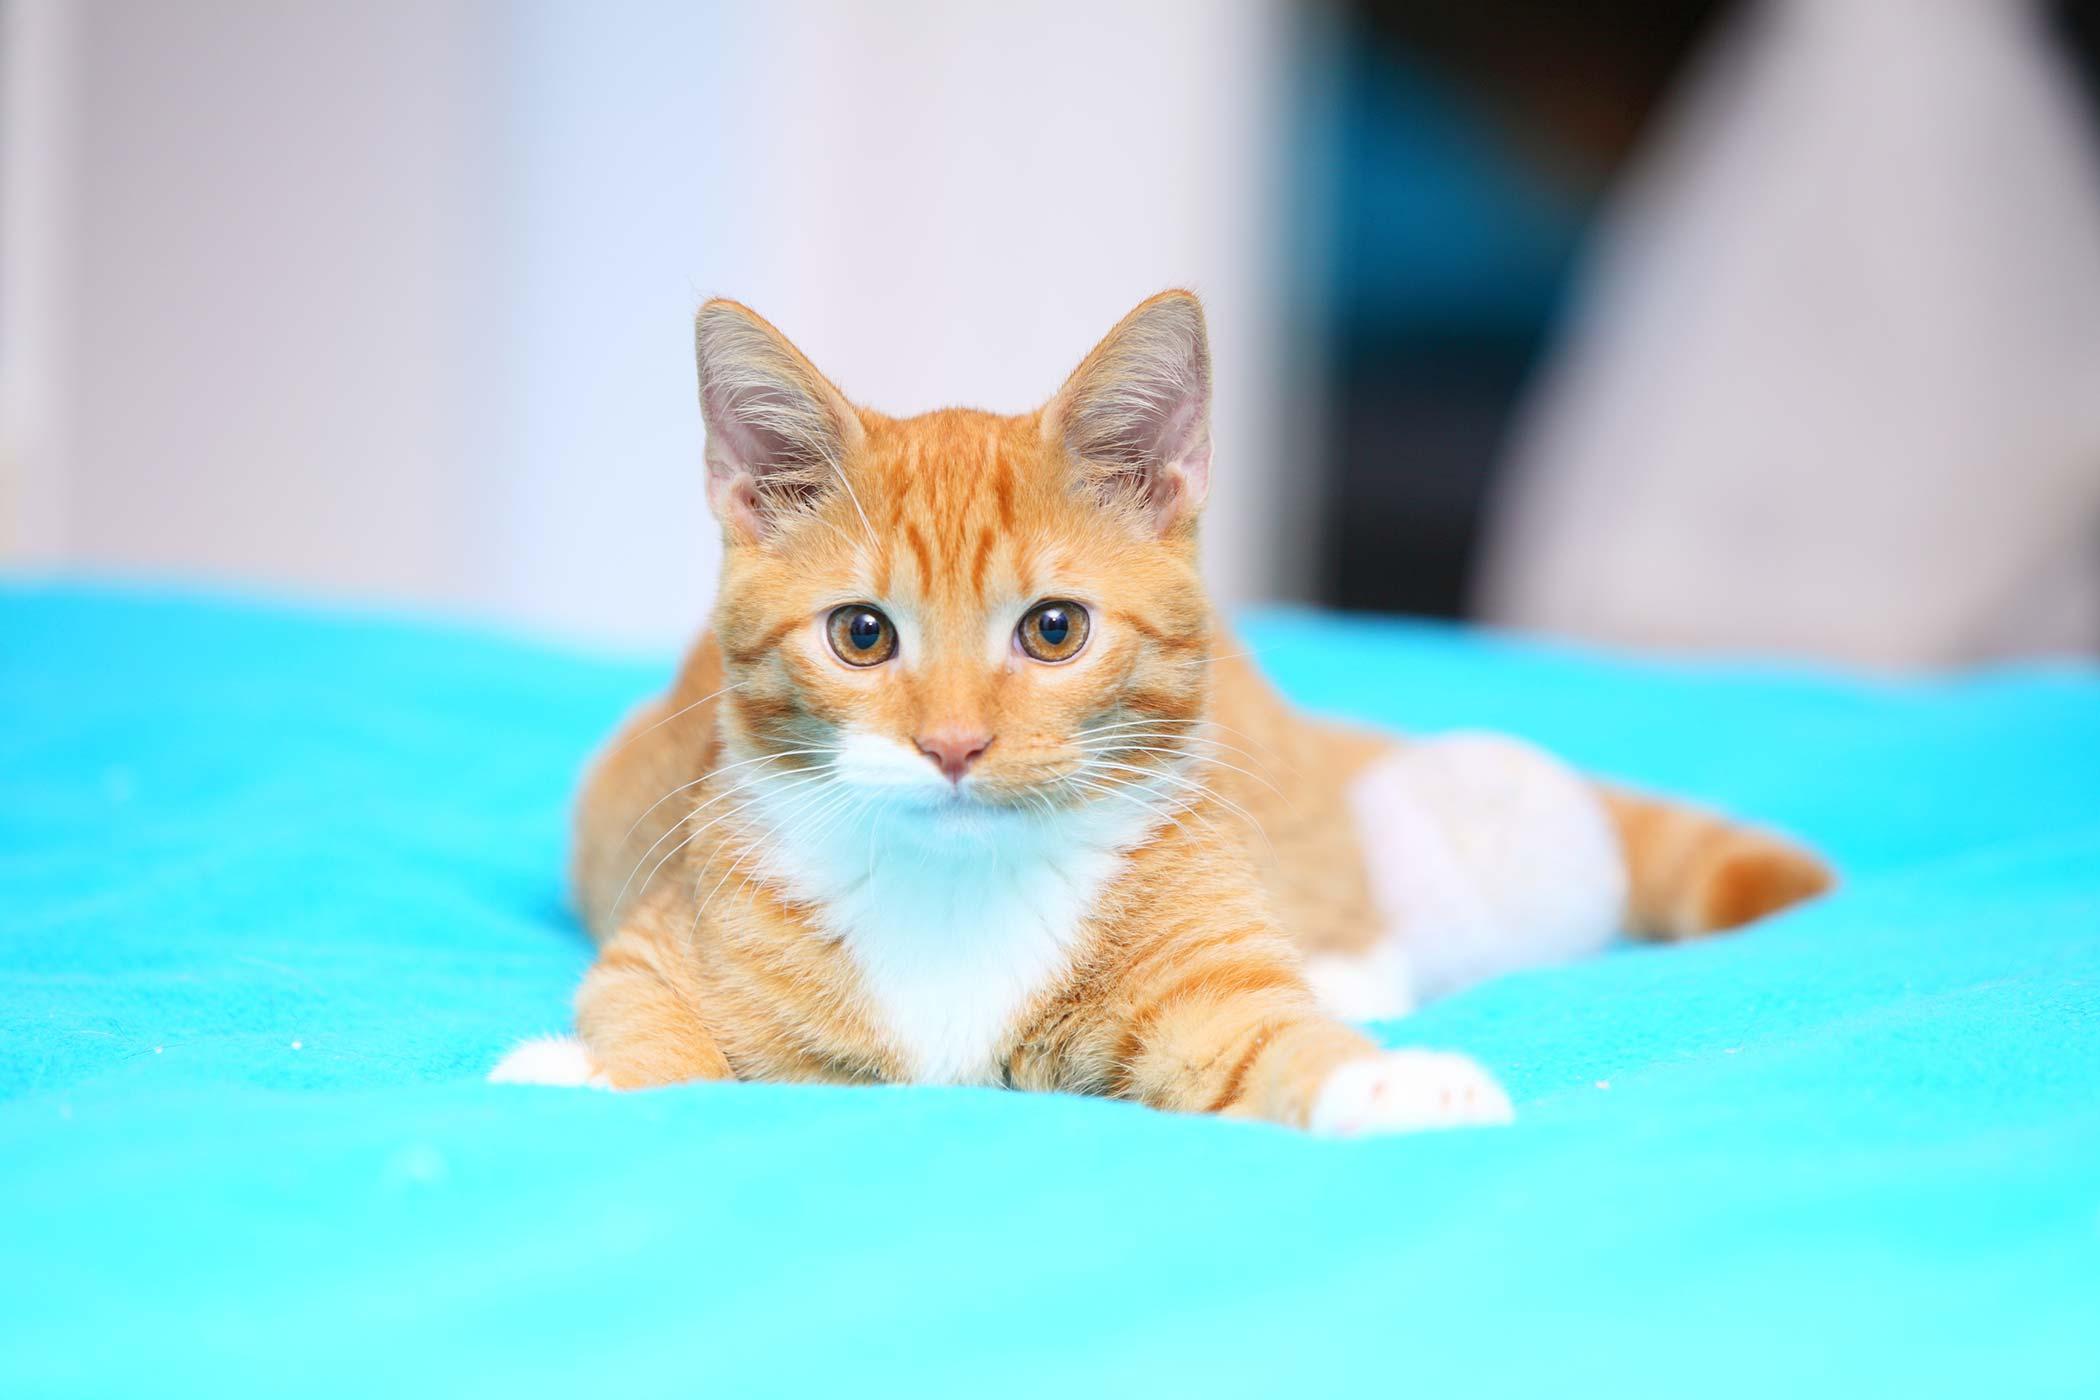 Feline Calicivirus Infection in Cats